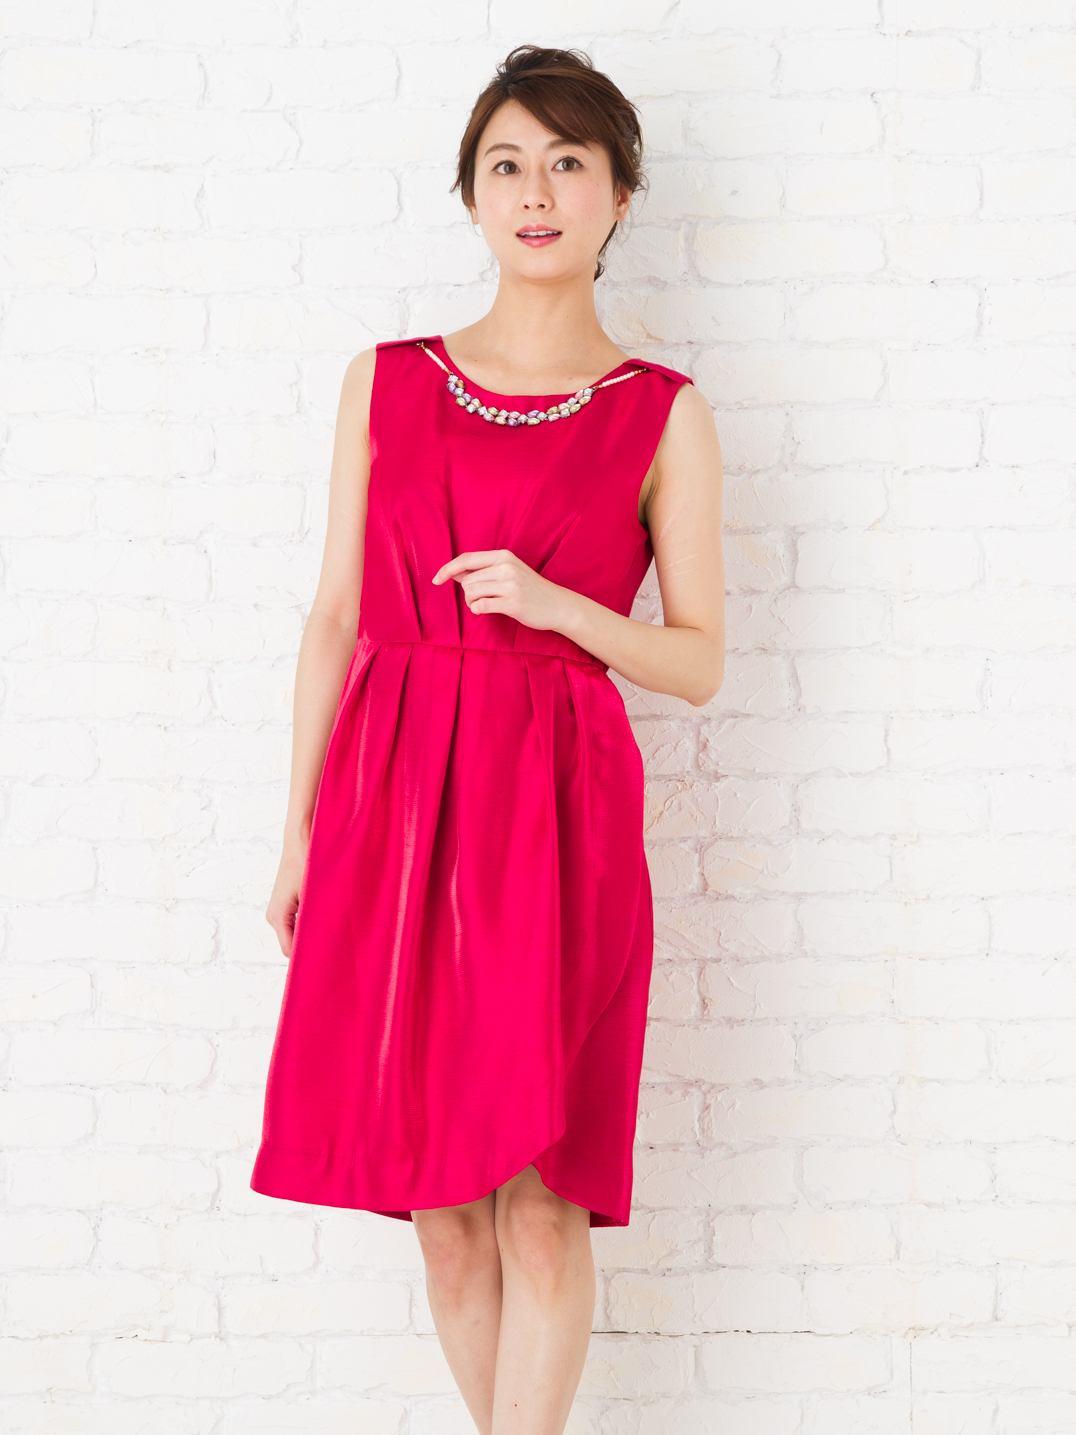 RYK ドレス / Mサイズ (DOC0005)